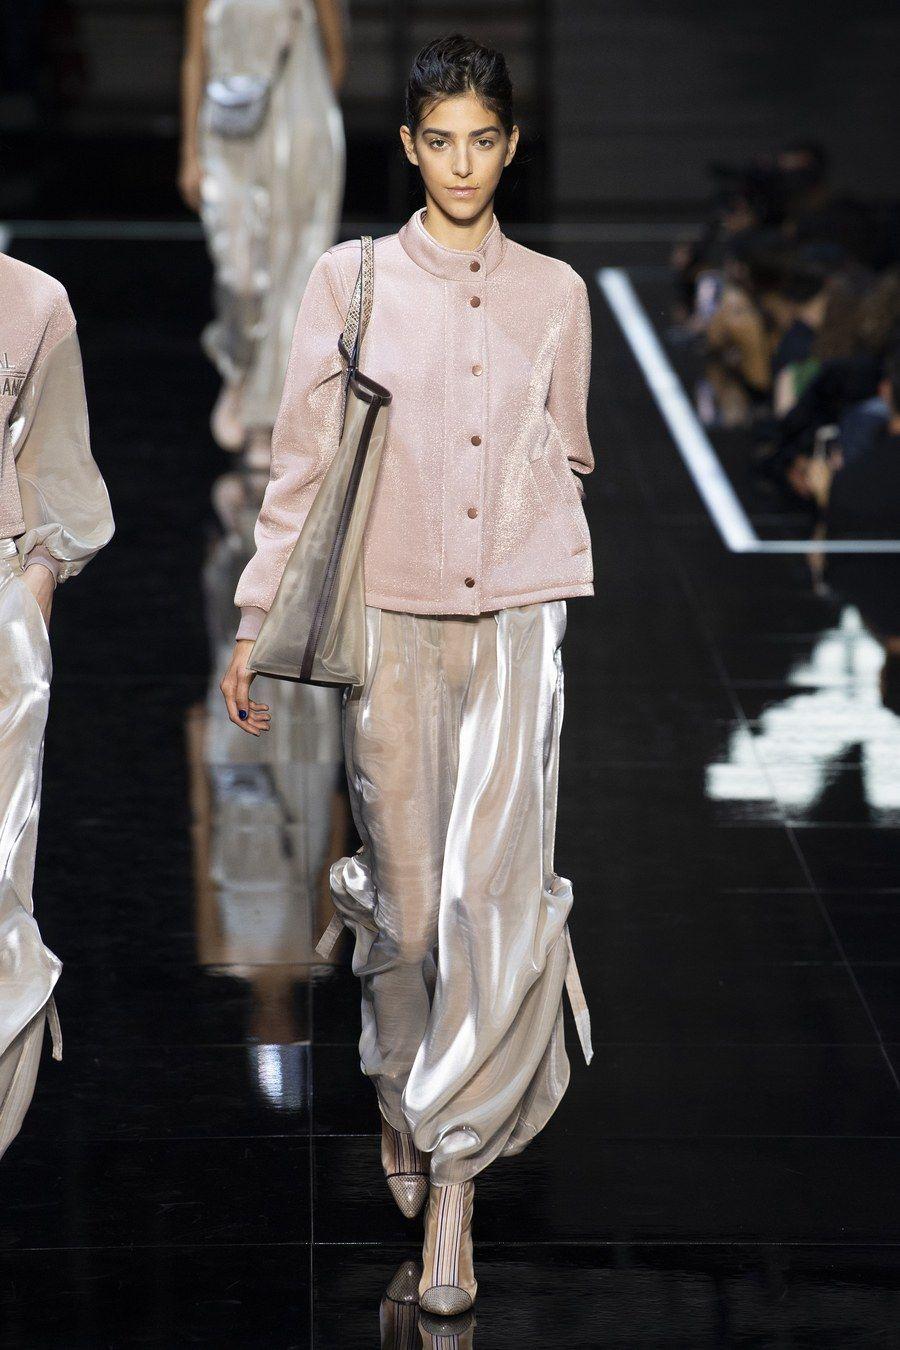 Fashion week Armani emporio spring runway review for girls